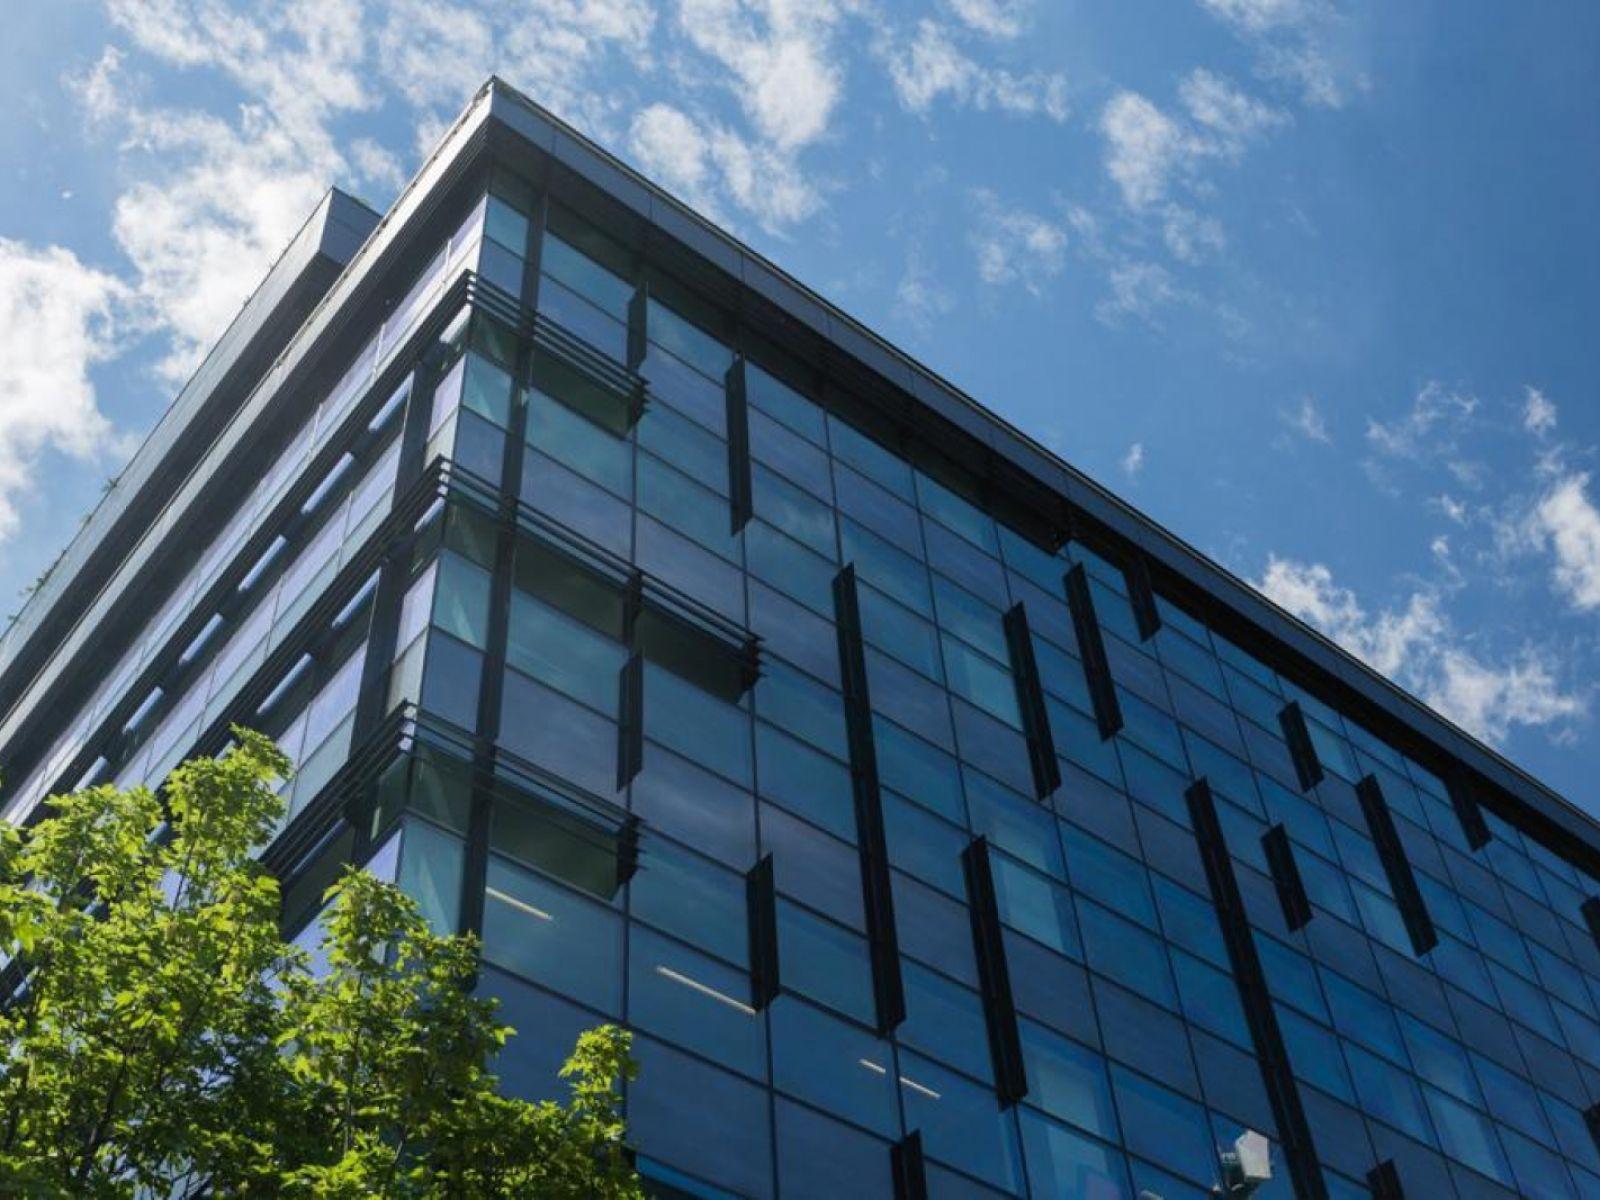 One Herăstrău Office: 15 million-euro transaction for the newest office project